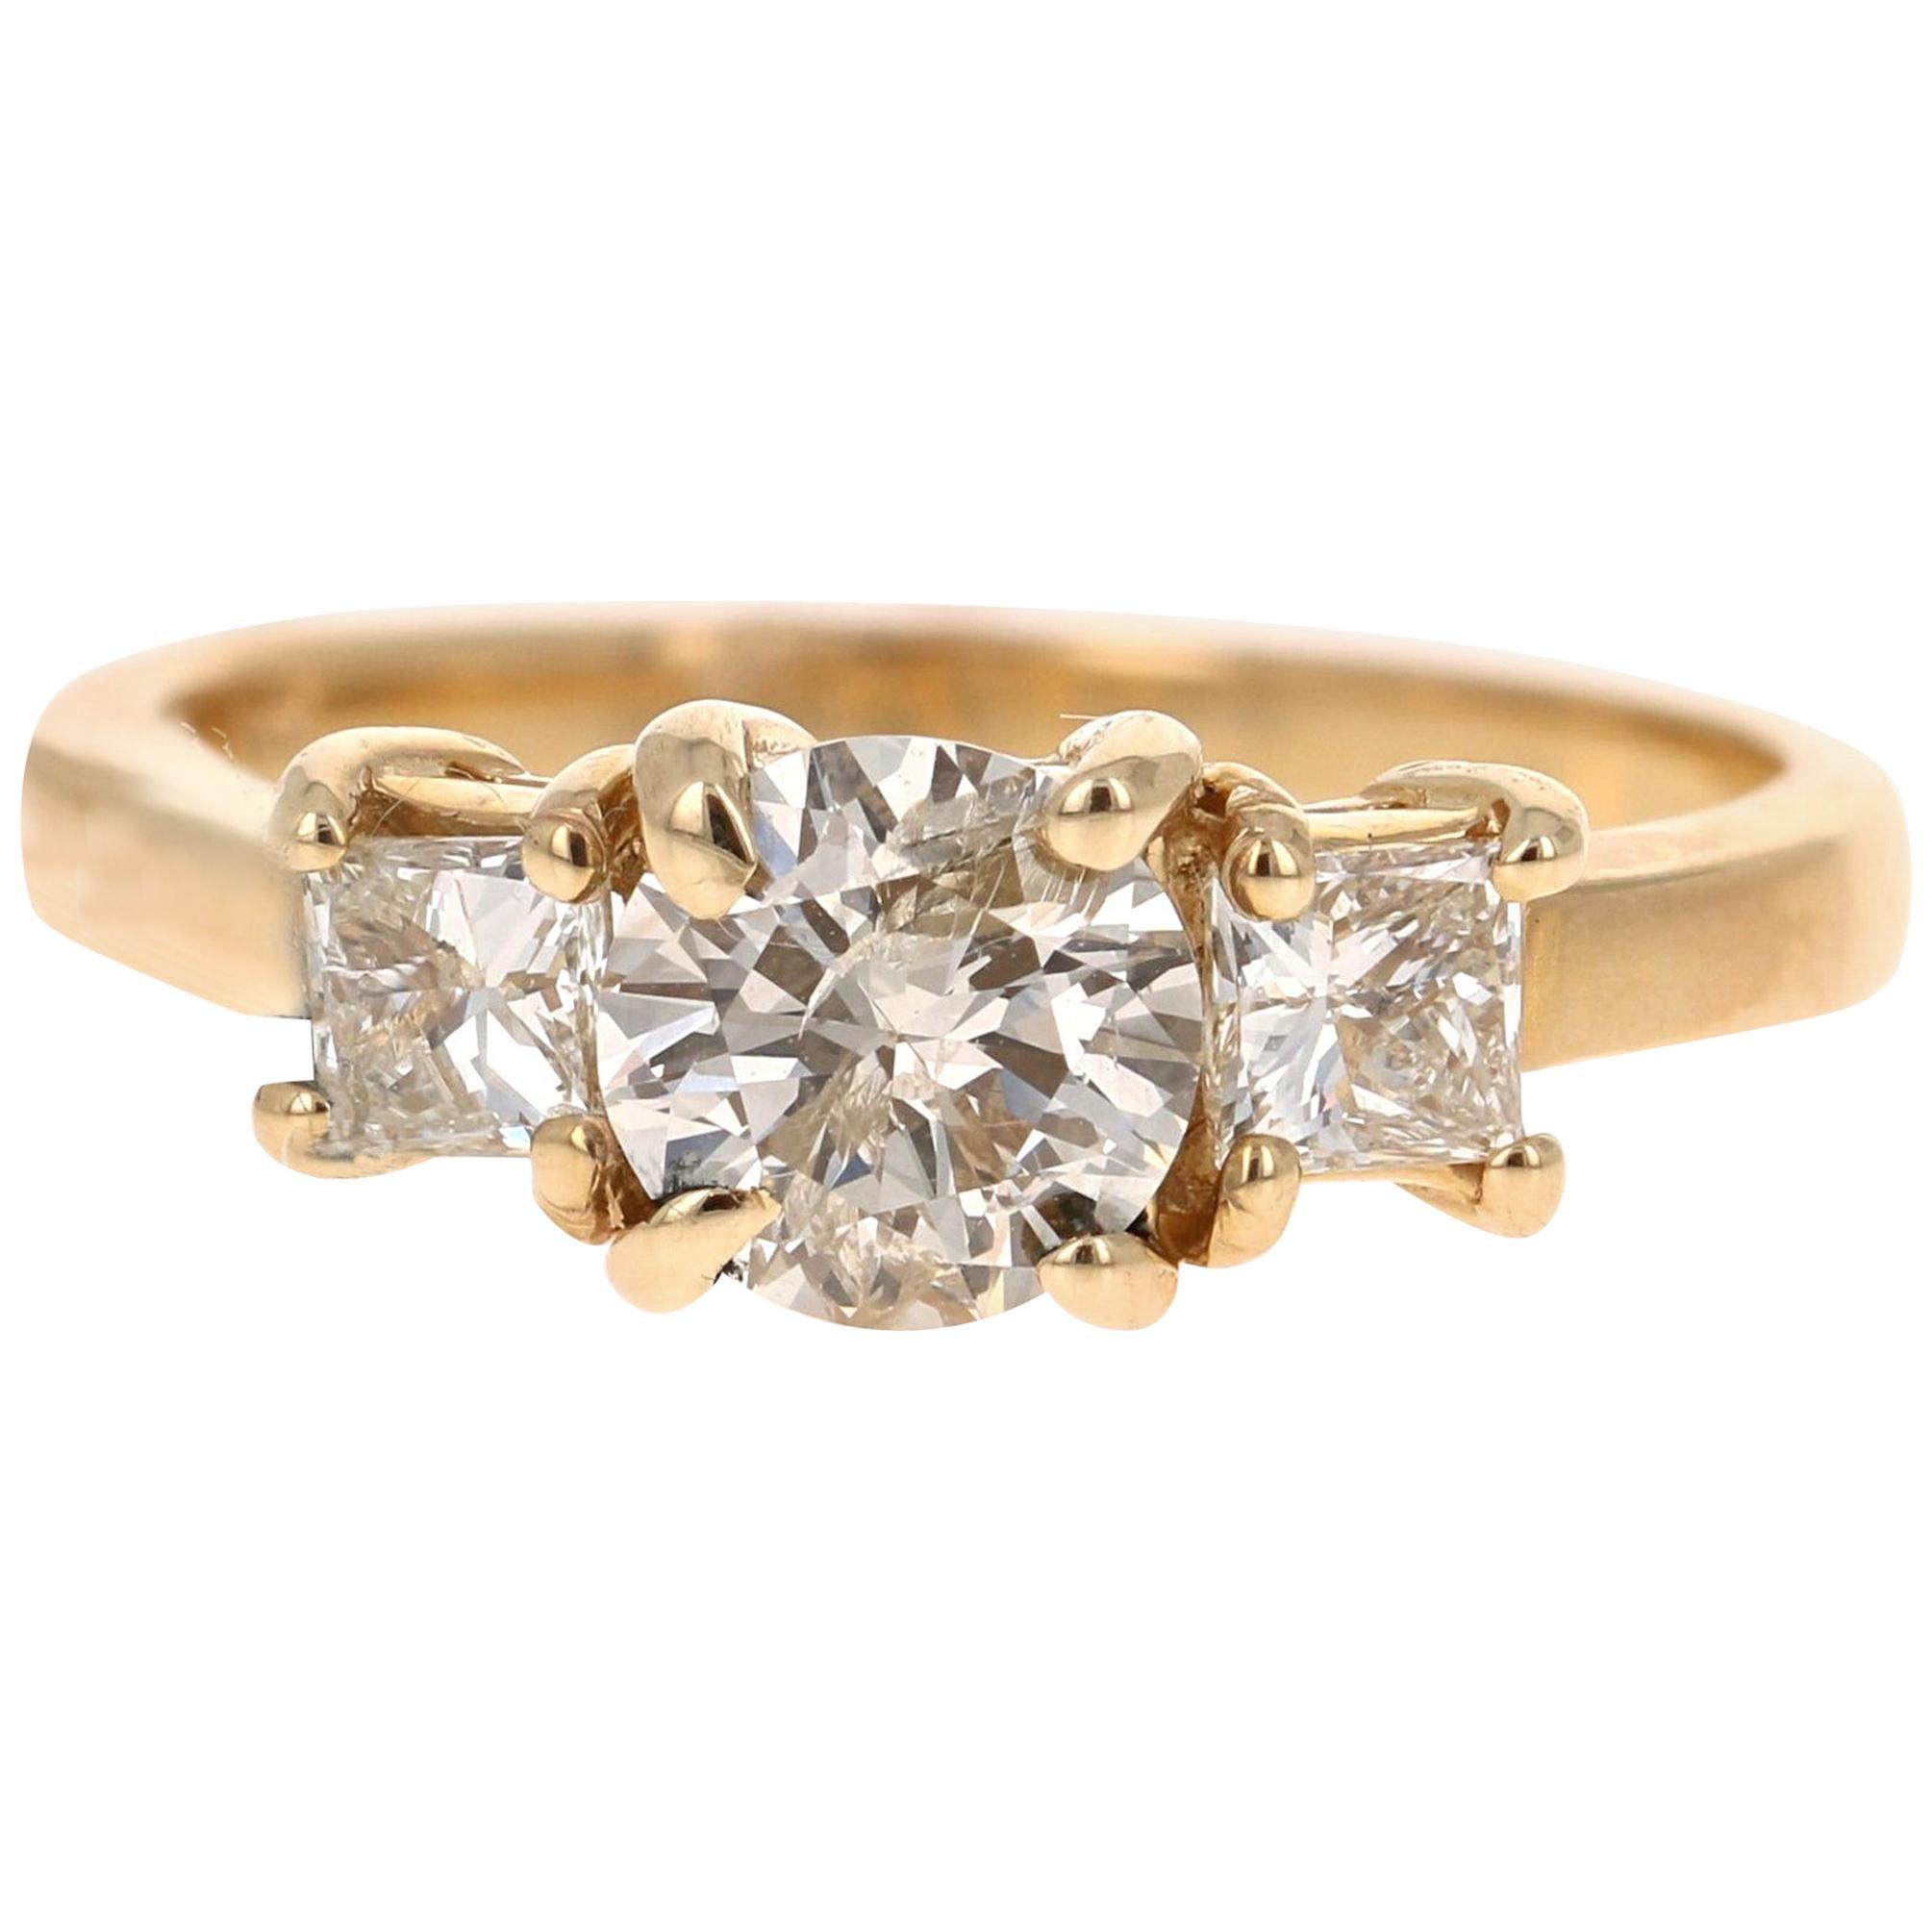 1.22 Carat Three-Stone Diamond 14 Karat Yellow Gold Engagement Ring